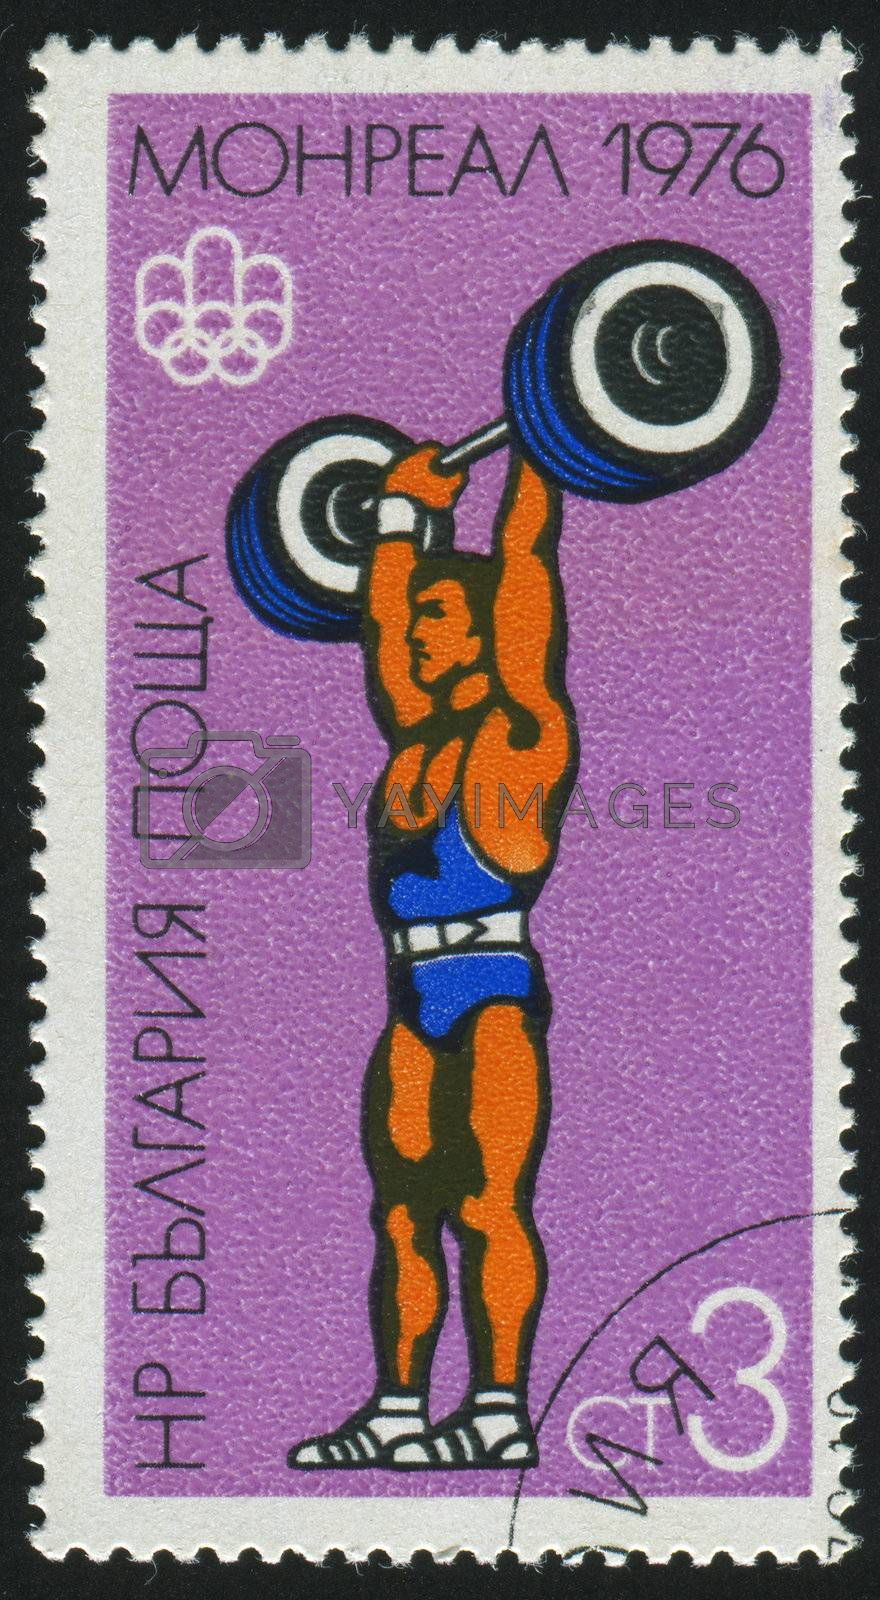 BULGARIA - CIRCA 1976: stamp printed by Bulgaria, shows weight lifting, circa 1976.